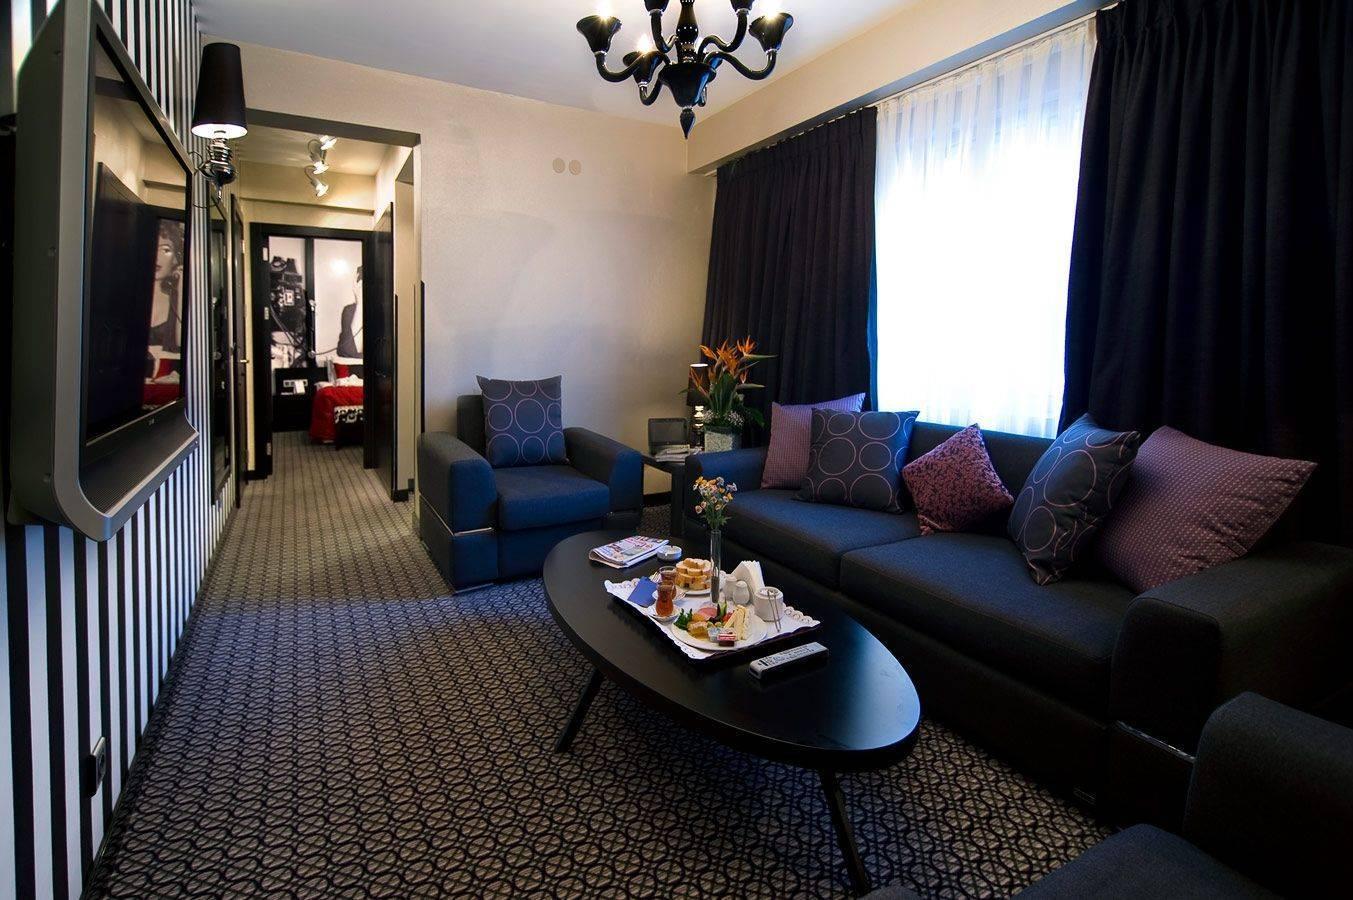 Maltepe 2000 Otel, Ankara, Maltepe, 27365